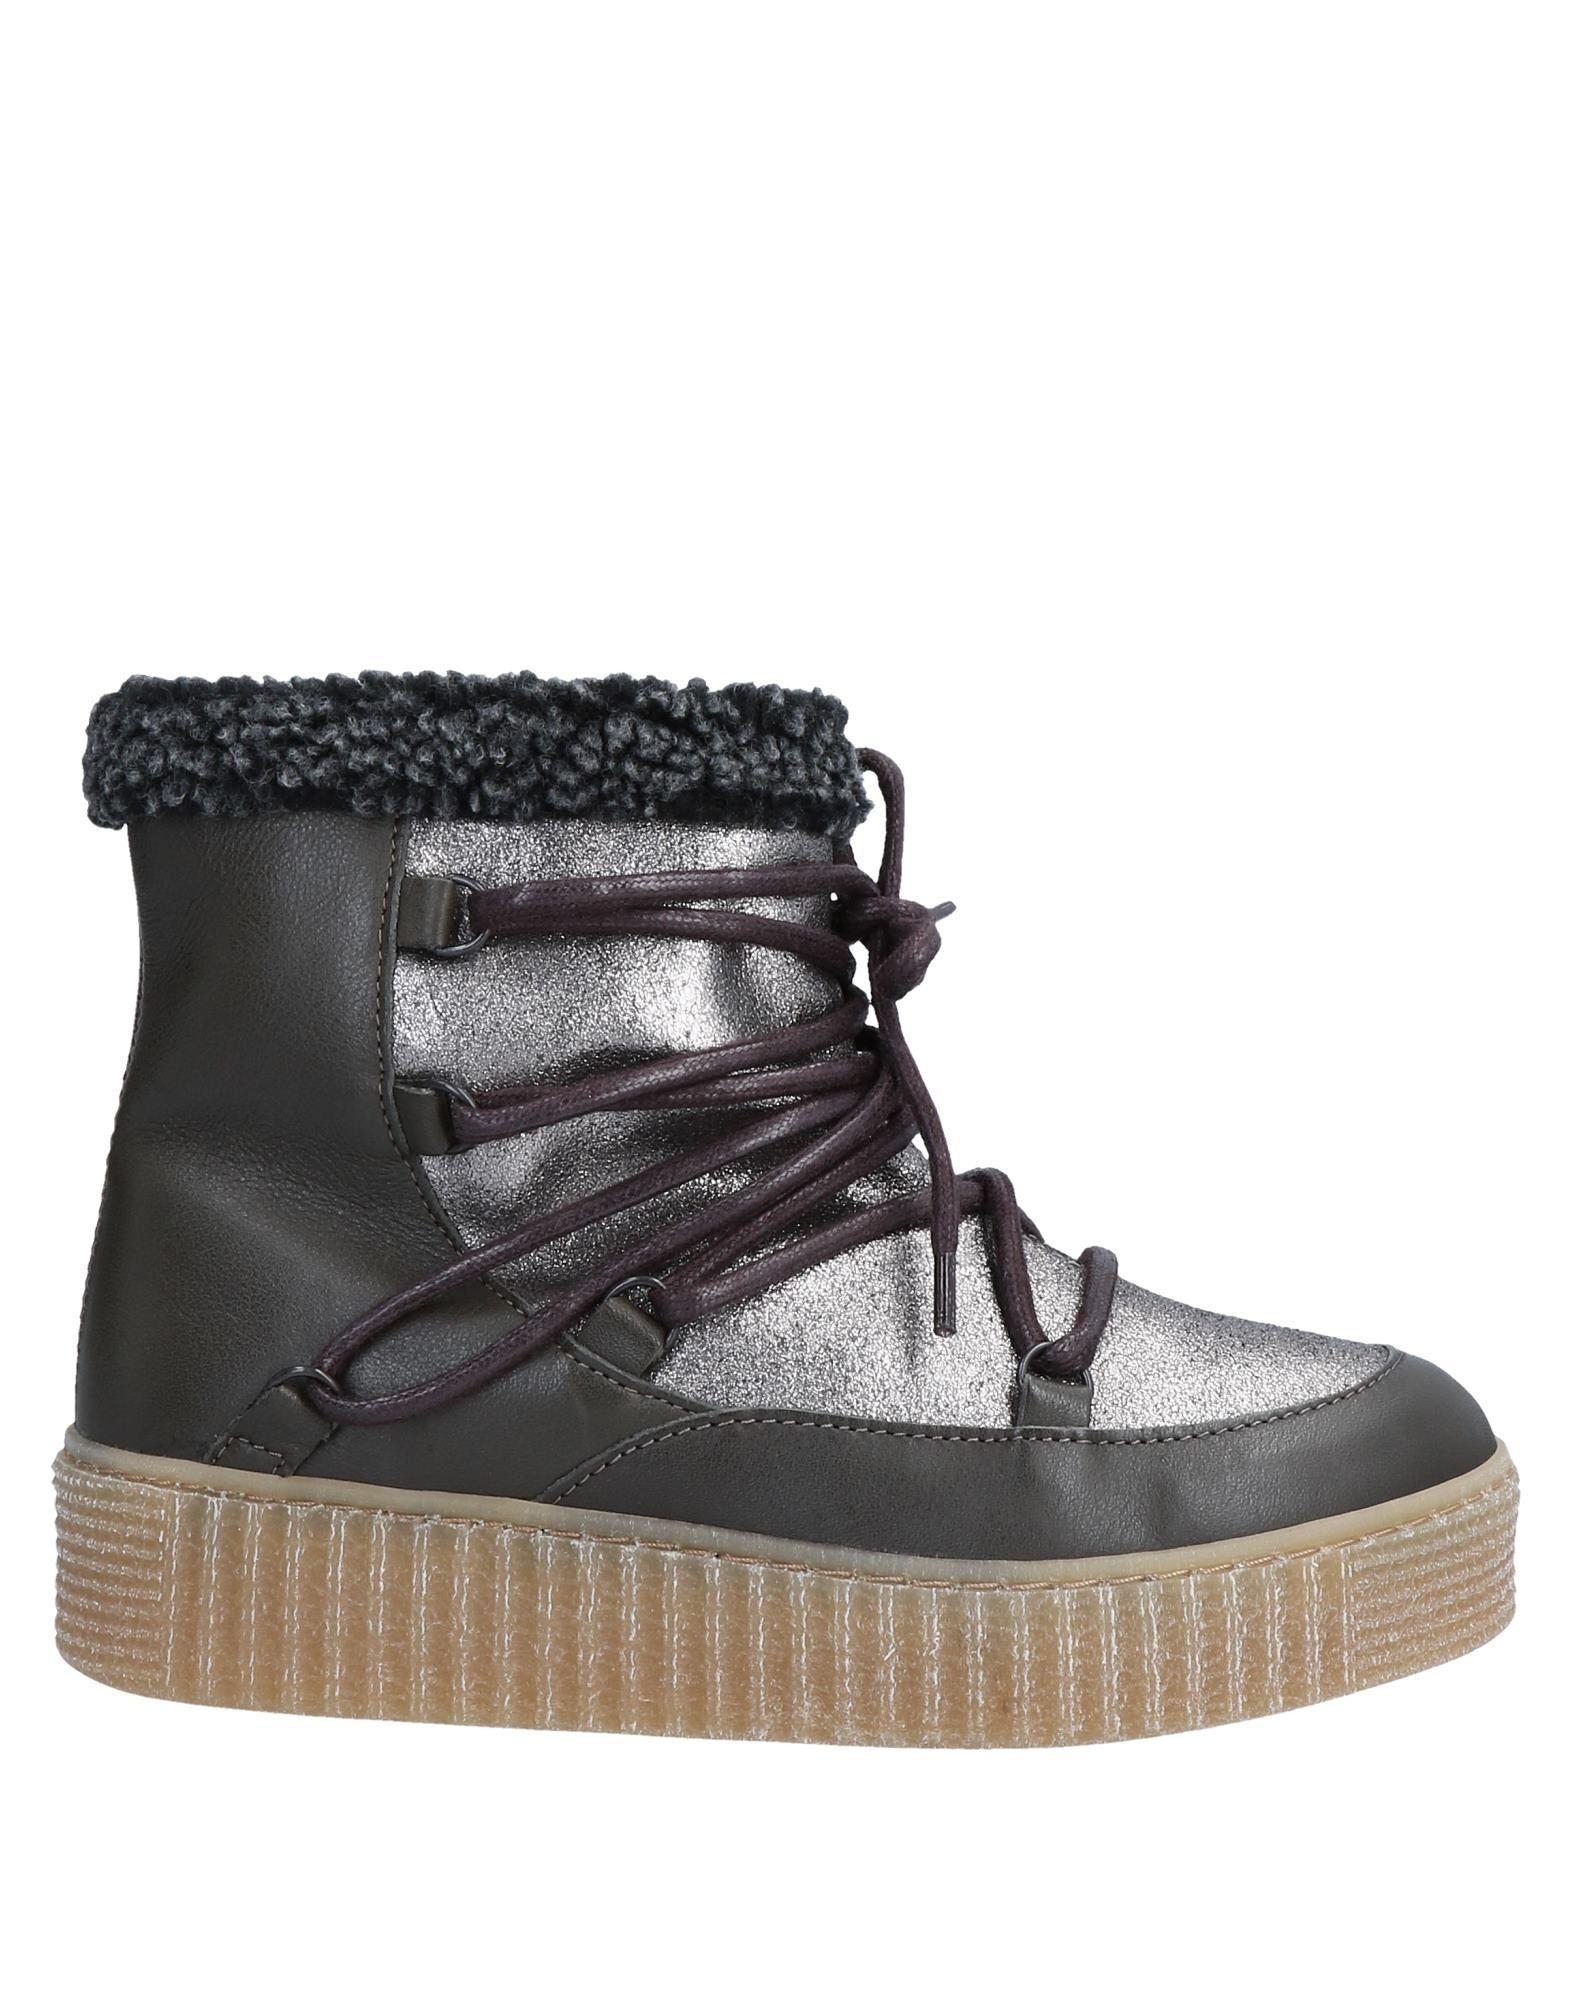 FOOTWEAR Pieces Lead Woman Leather